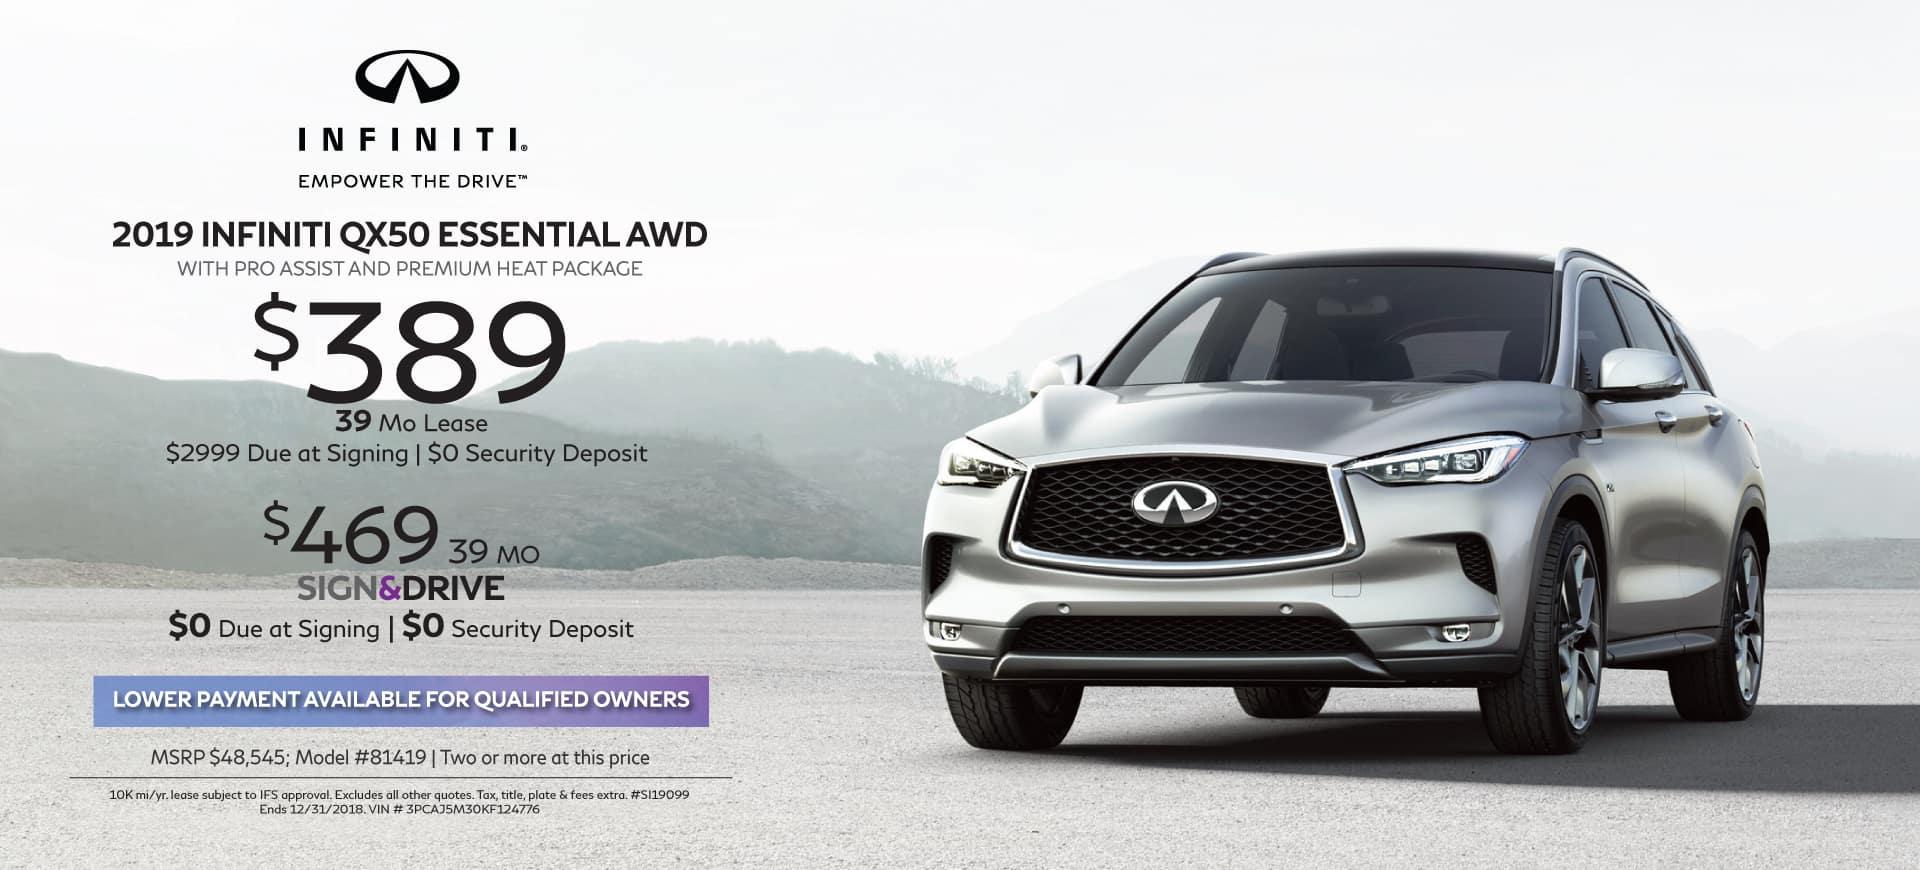 2018 INFINITI specials QX50 ESSENTIAL AWD